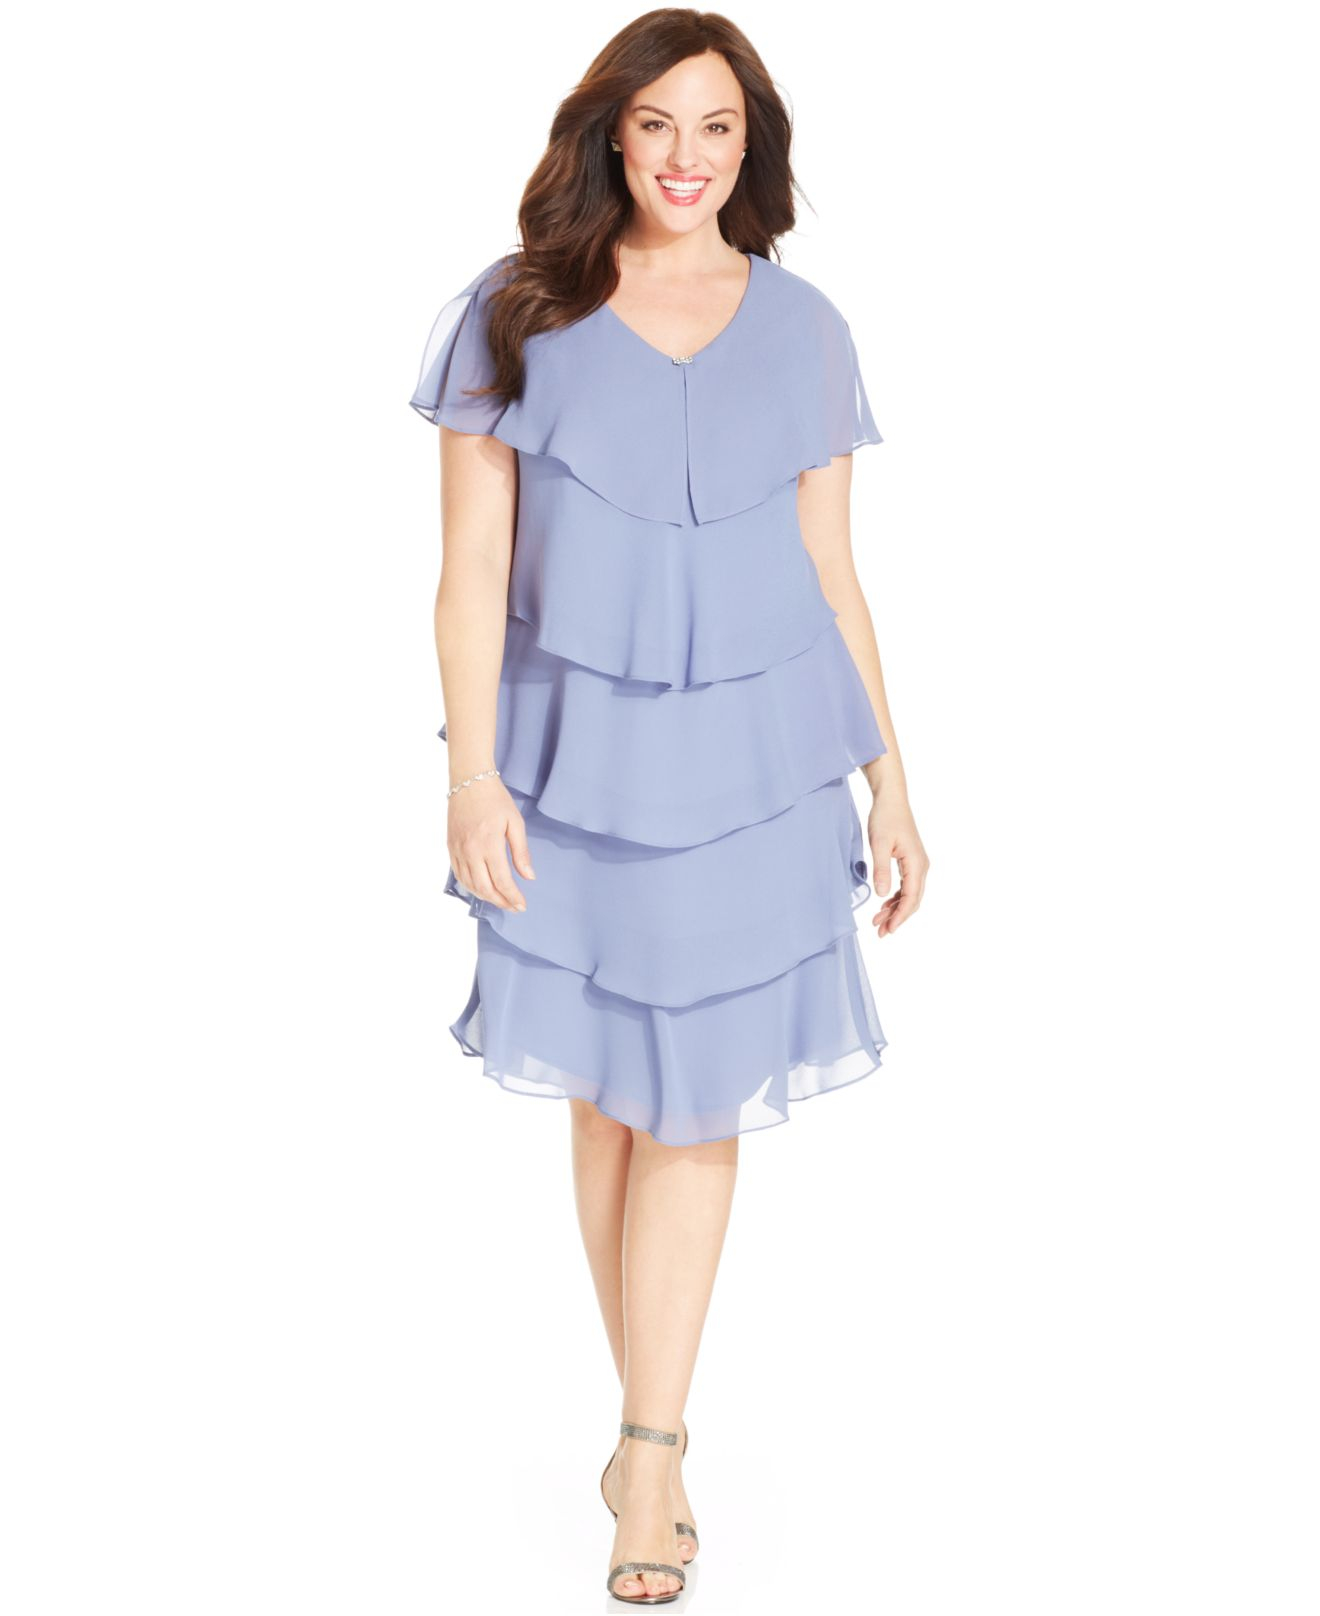 Patra Blue Plus Size Short-sleeve Tiered Dress